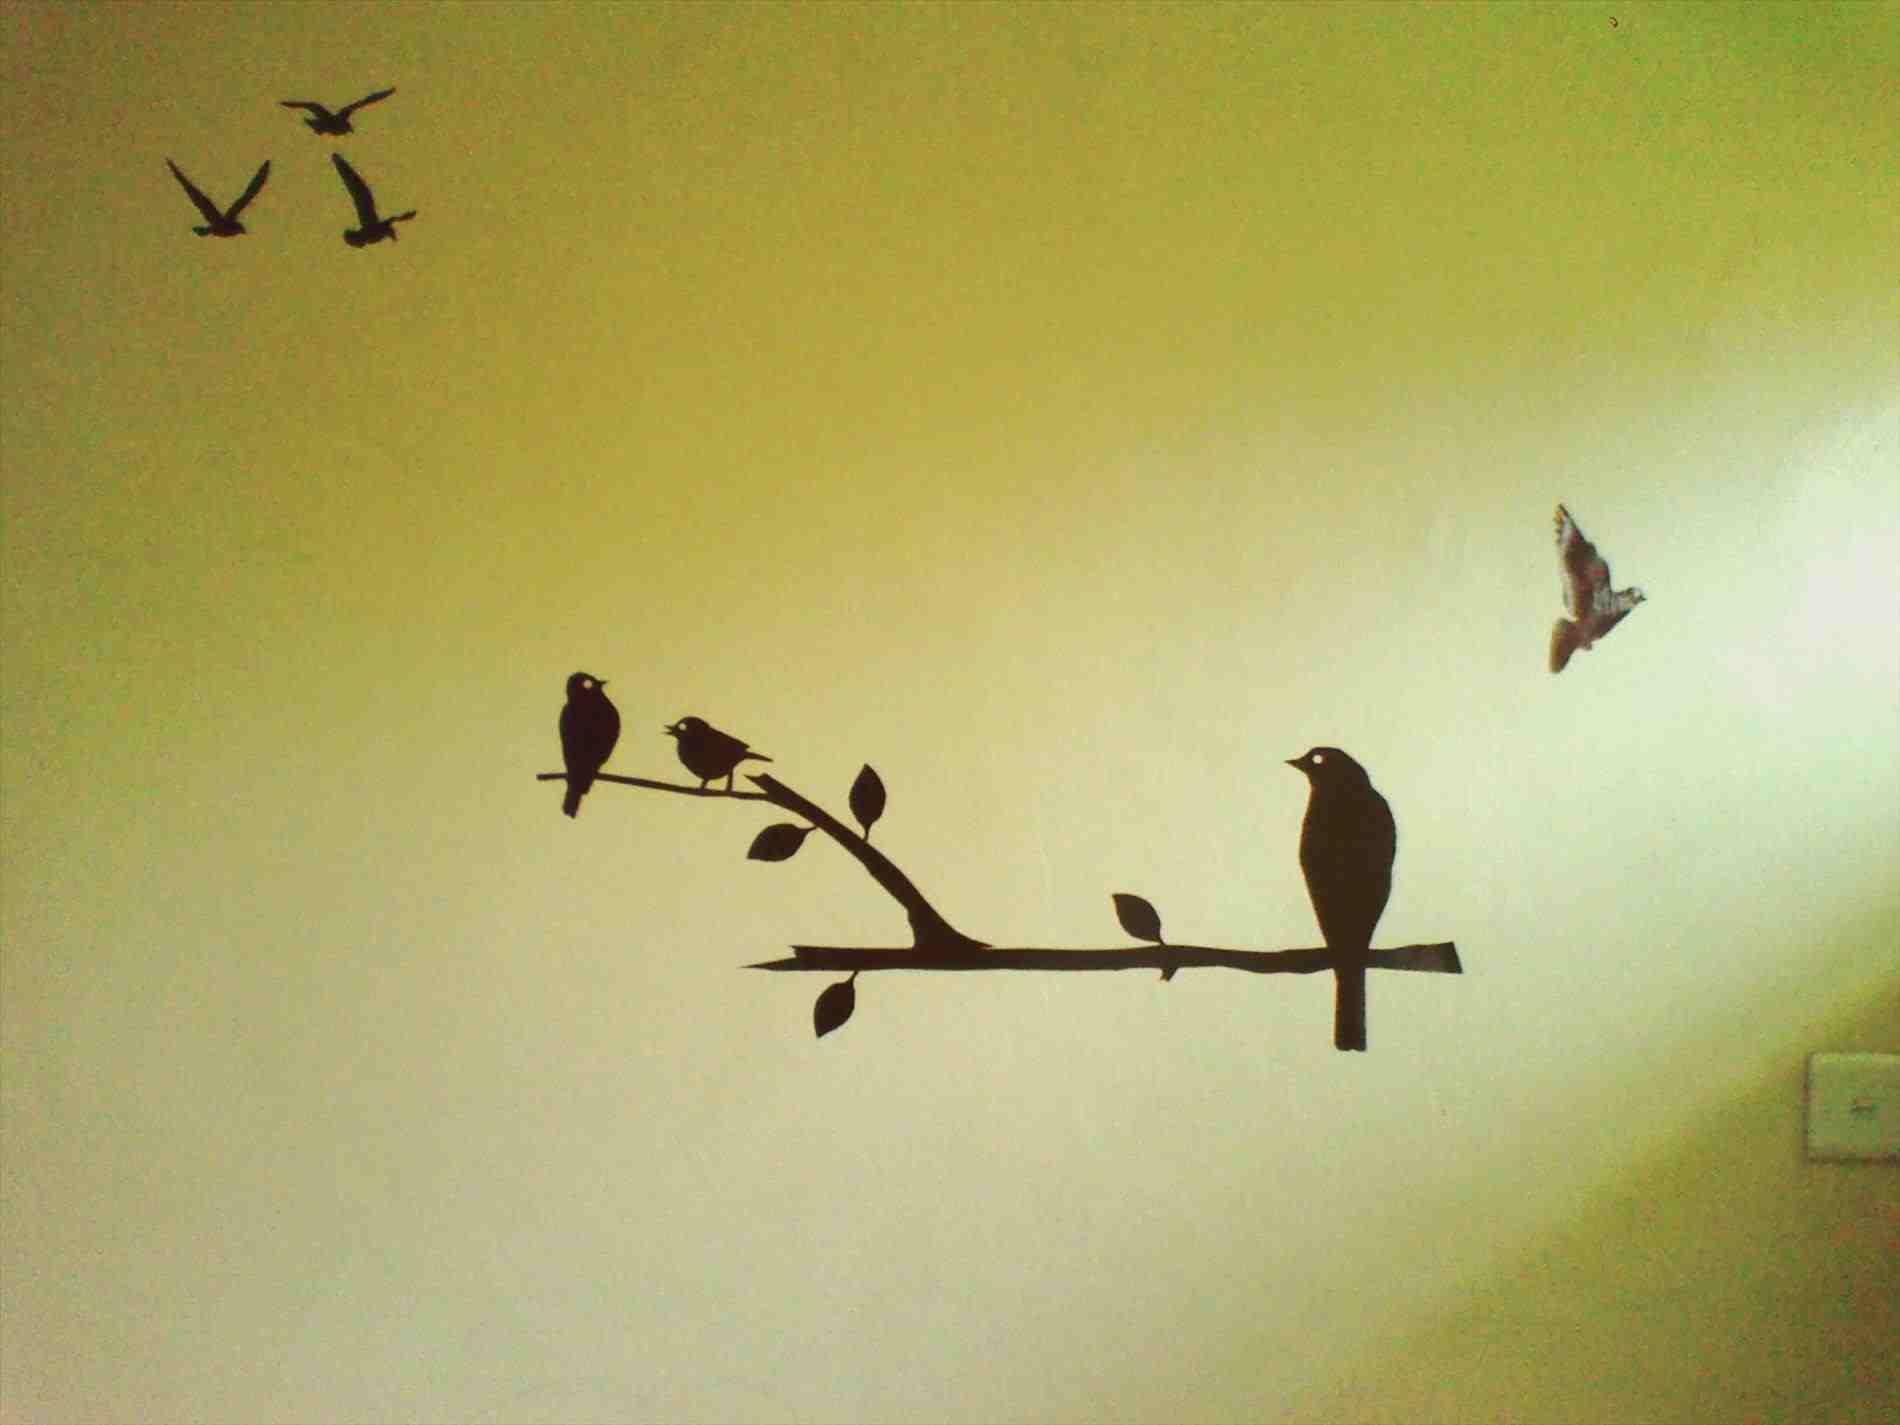 Free Photo Bird Painting Wall Animal Hang Texture Free Download Jooinn